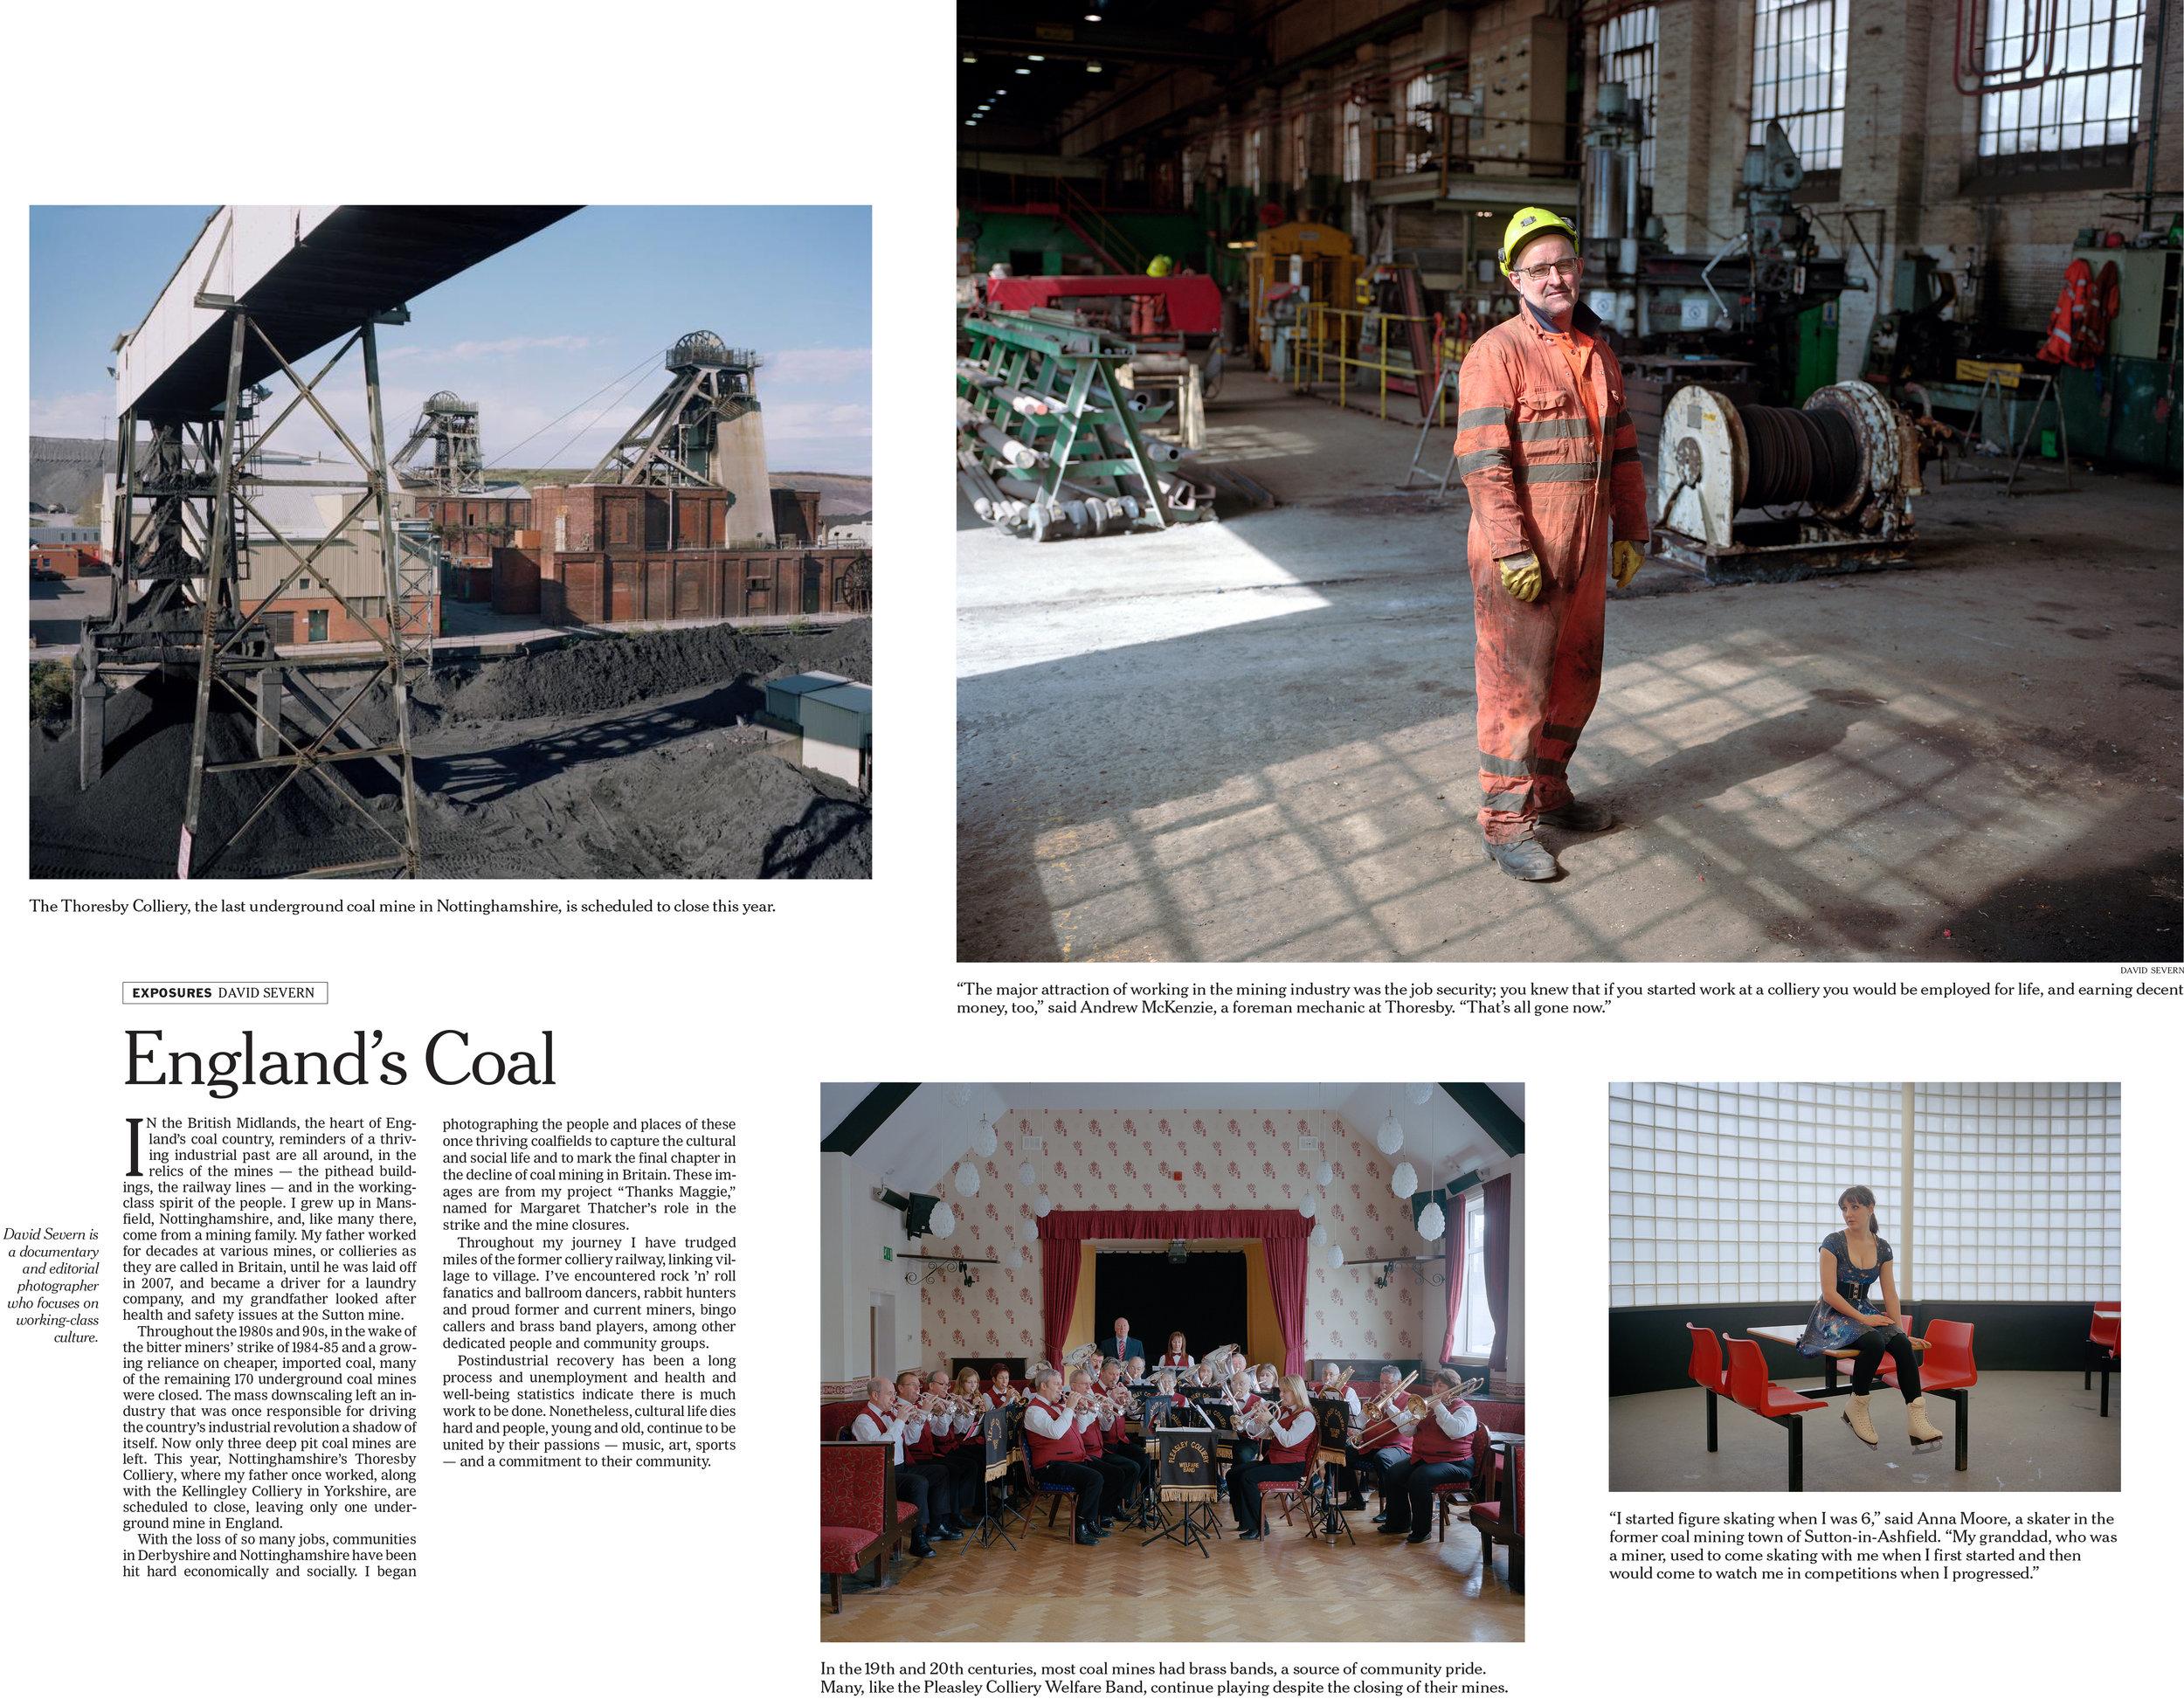 England's Coal, The New York Times tearsheet.